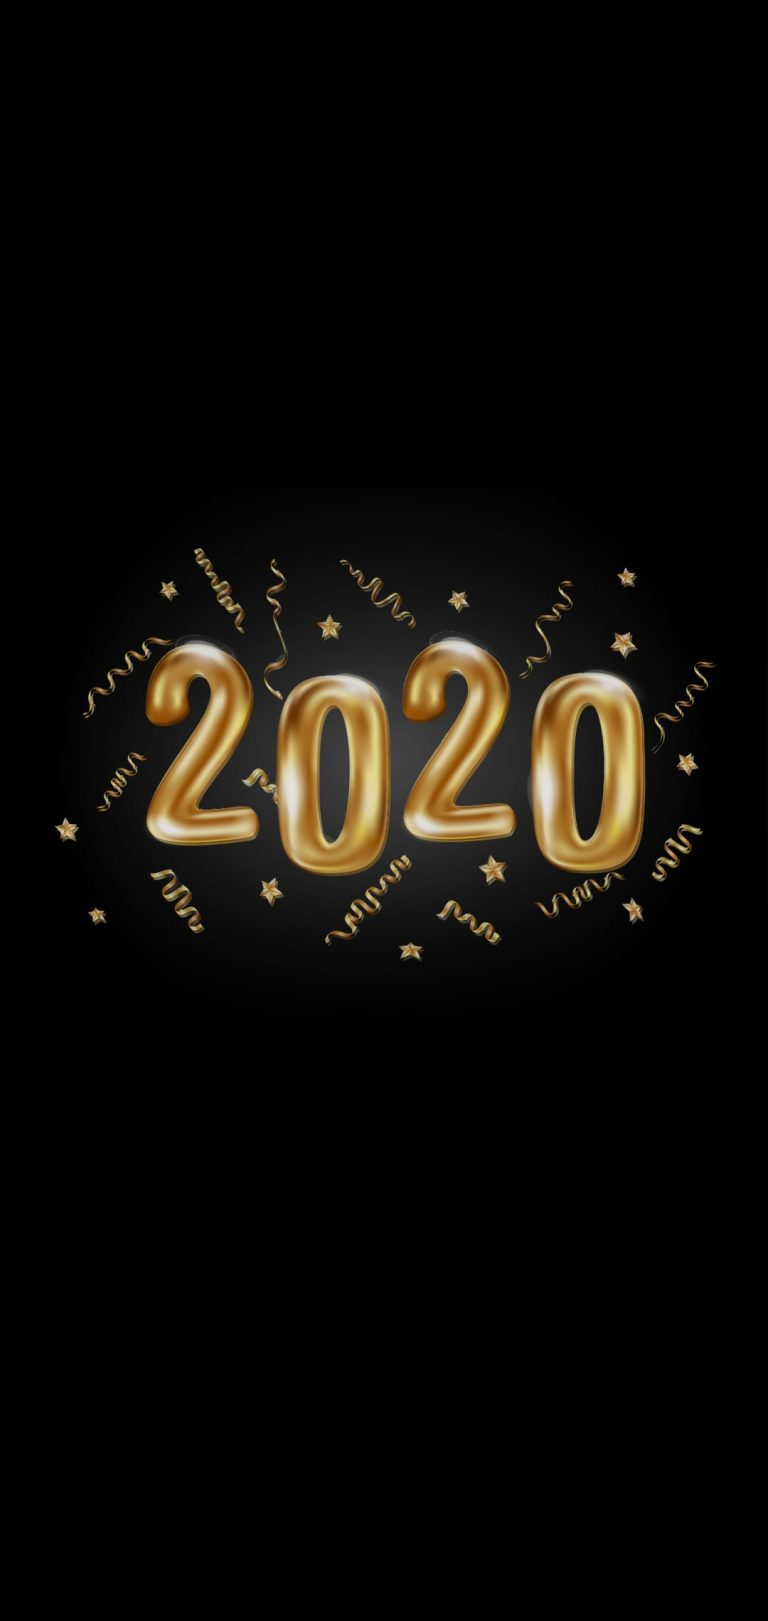 Happy New Year 2020 Phone Wallpaper 15 - [1080x2280]